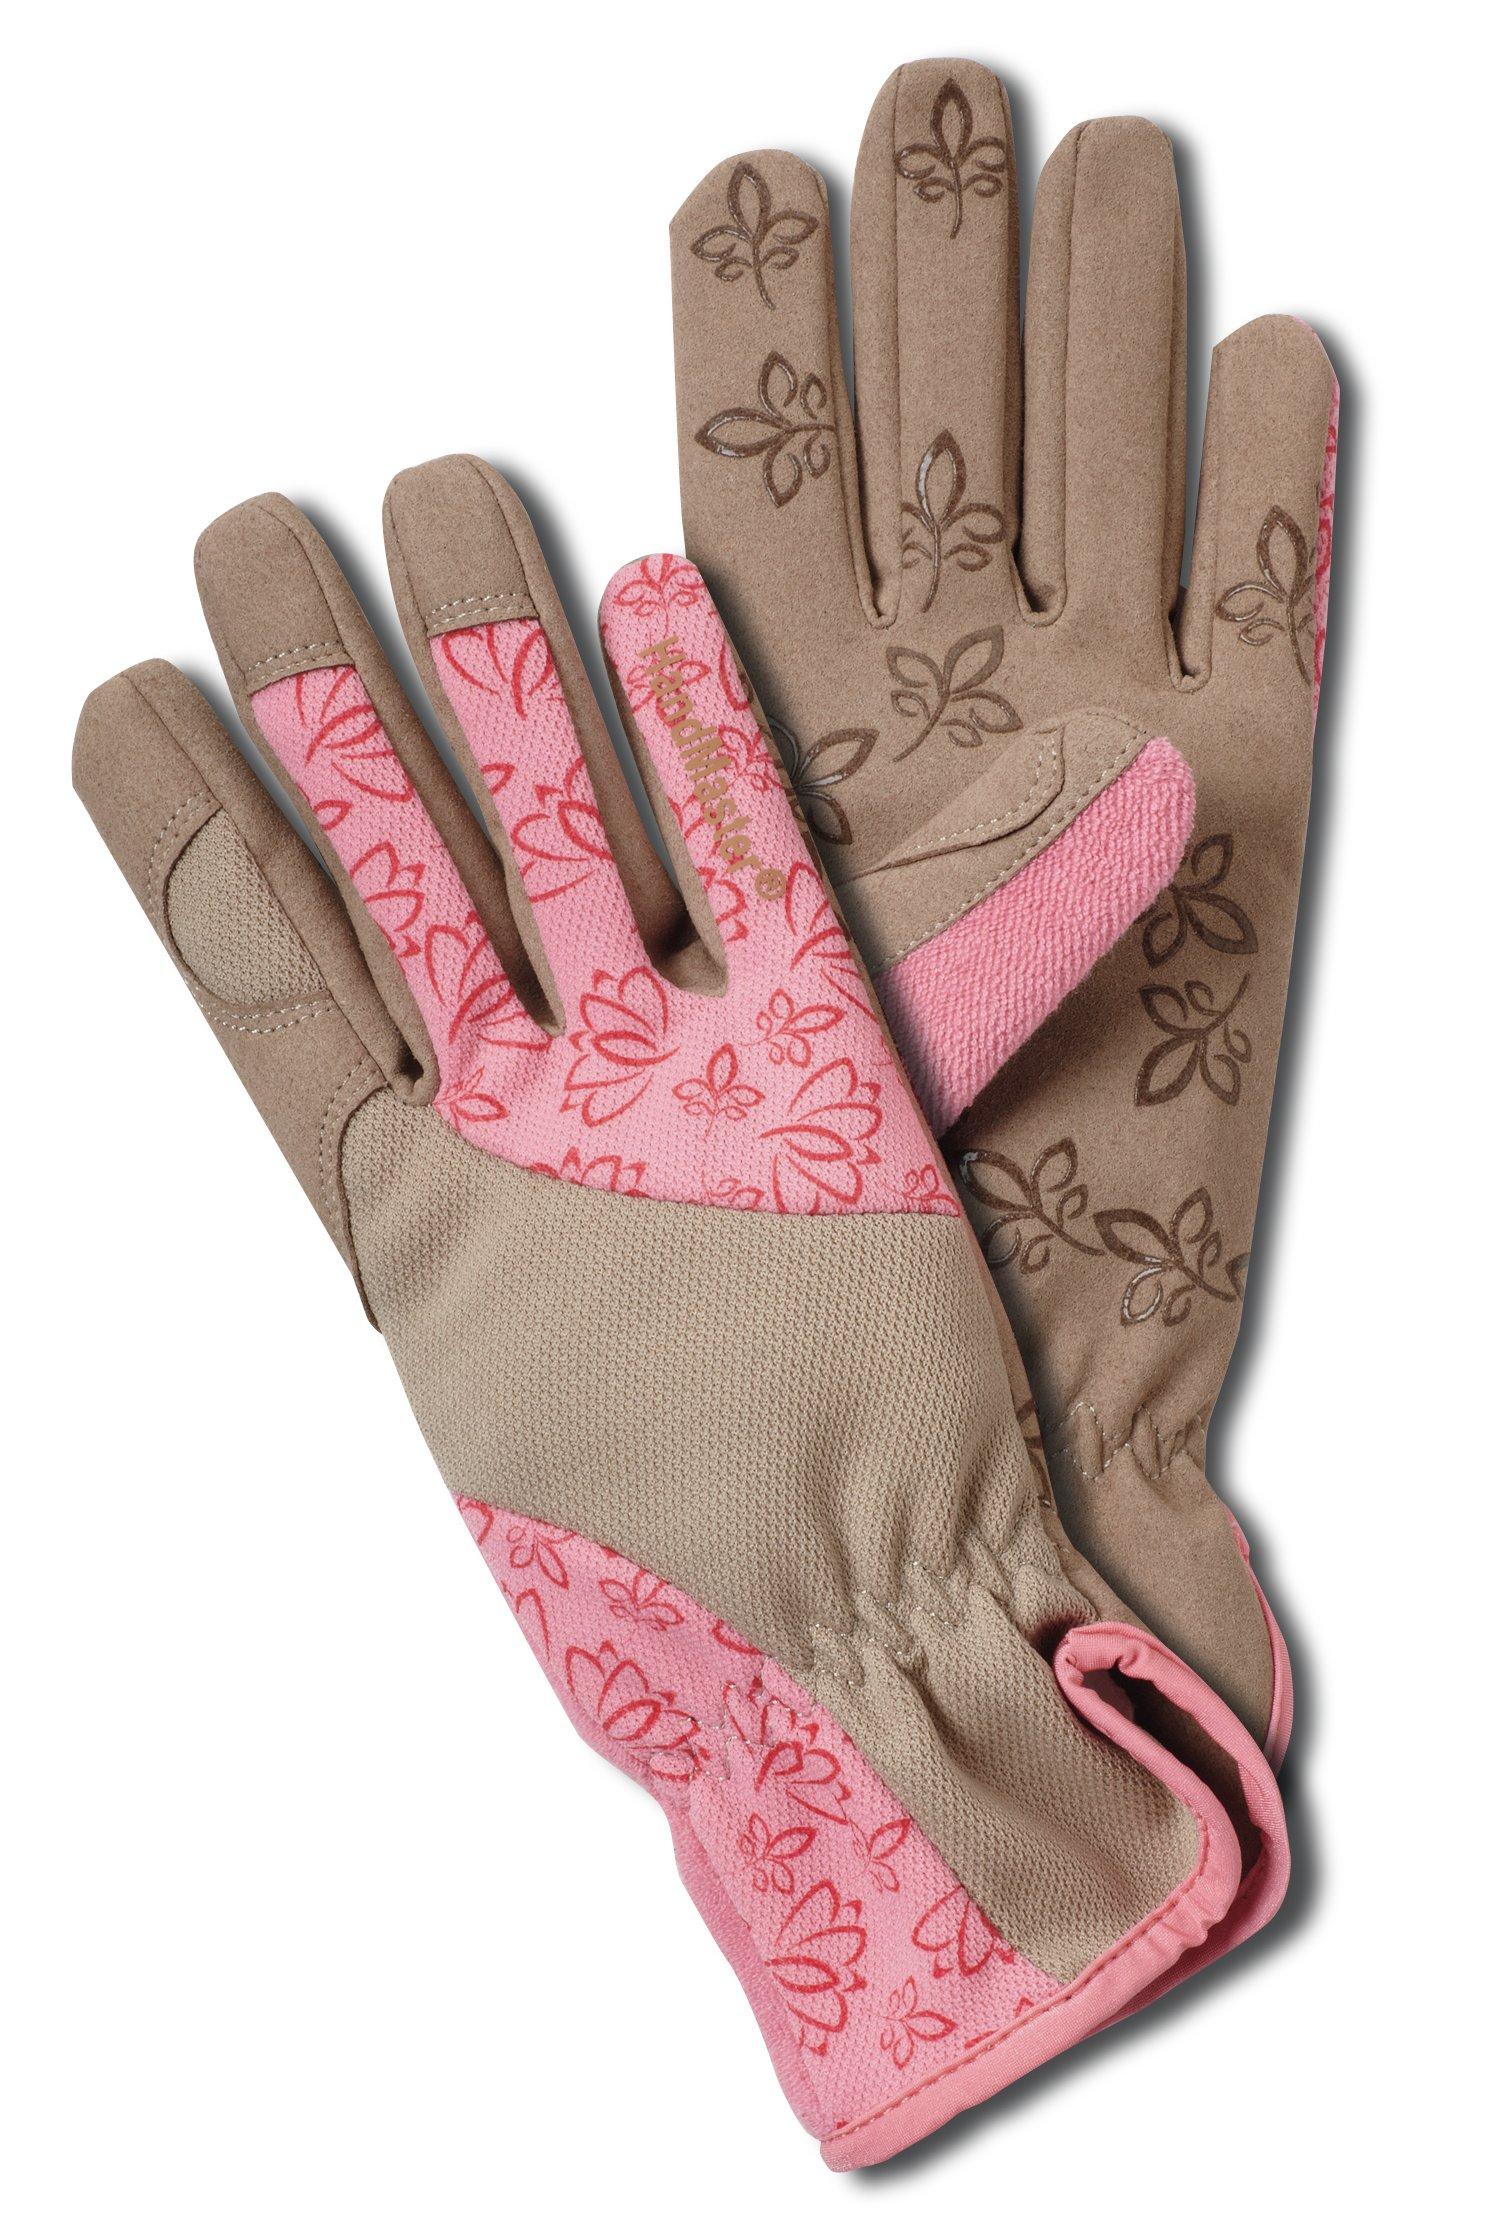 Magid BE168T Bella Women's Floral High Performance Garden Glove, Medium by Magid Glove & Safety (Image #1)